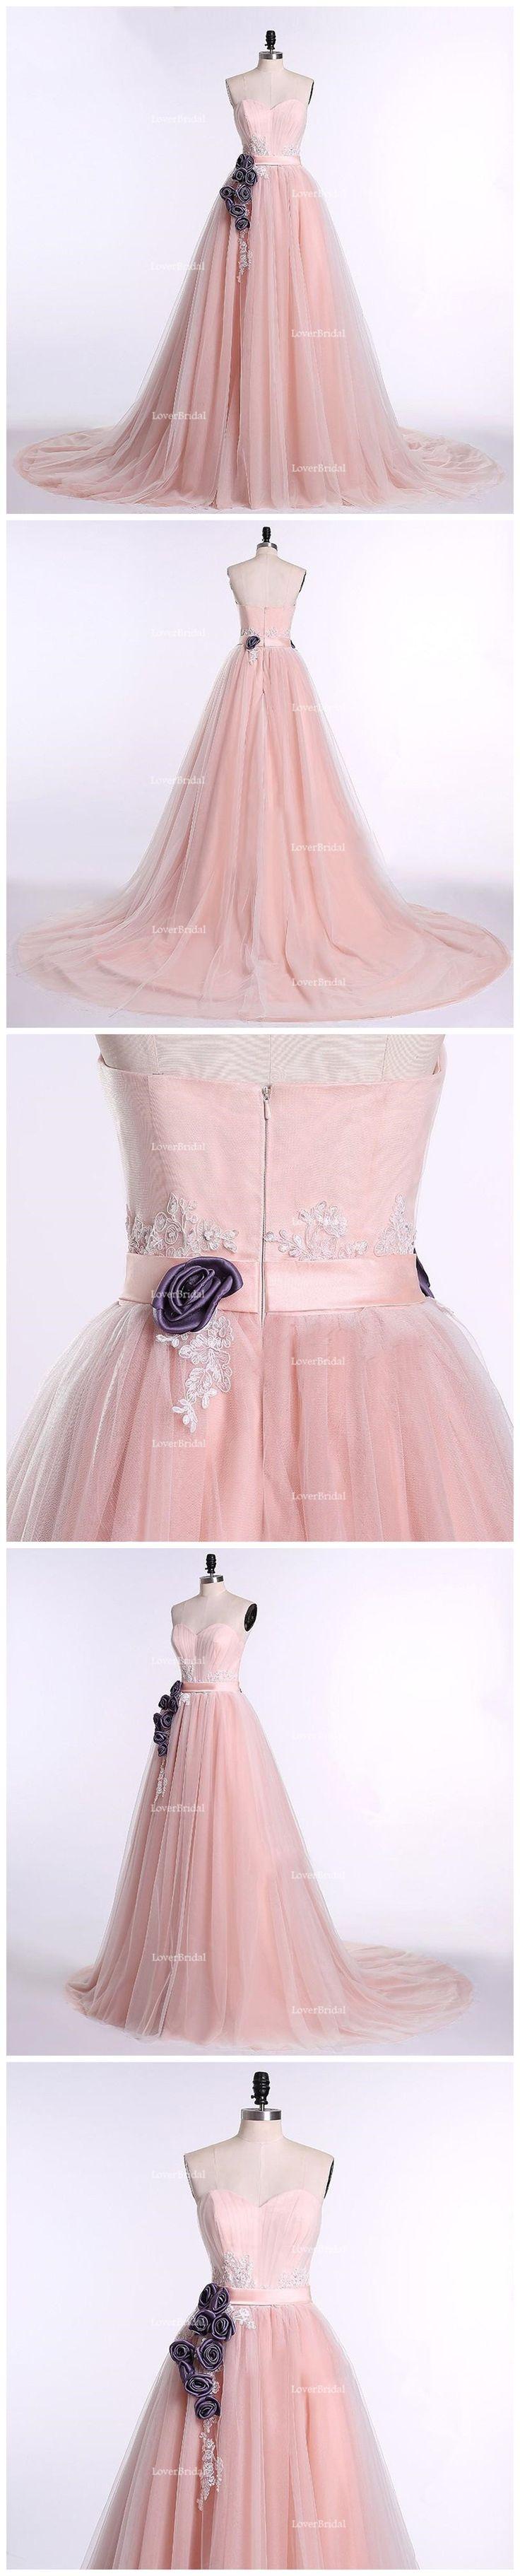 280 best Prom Dresses images on Pinterest | Party wear dresses ...